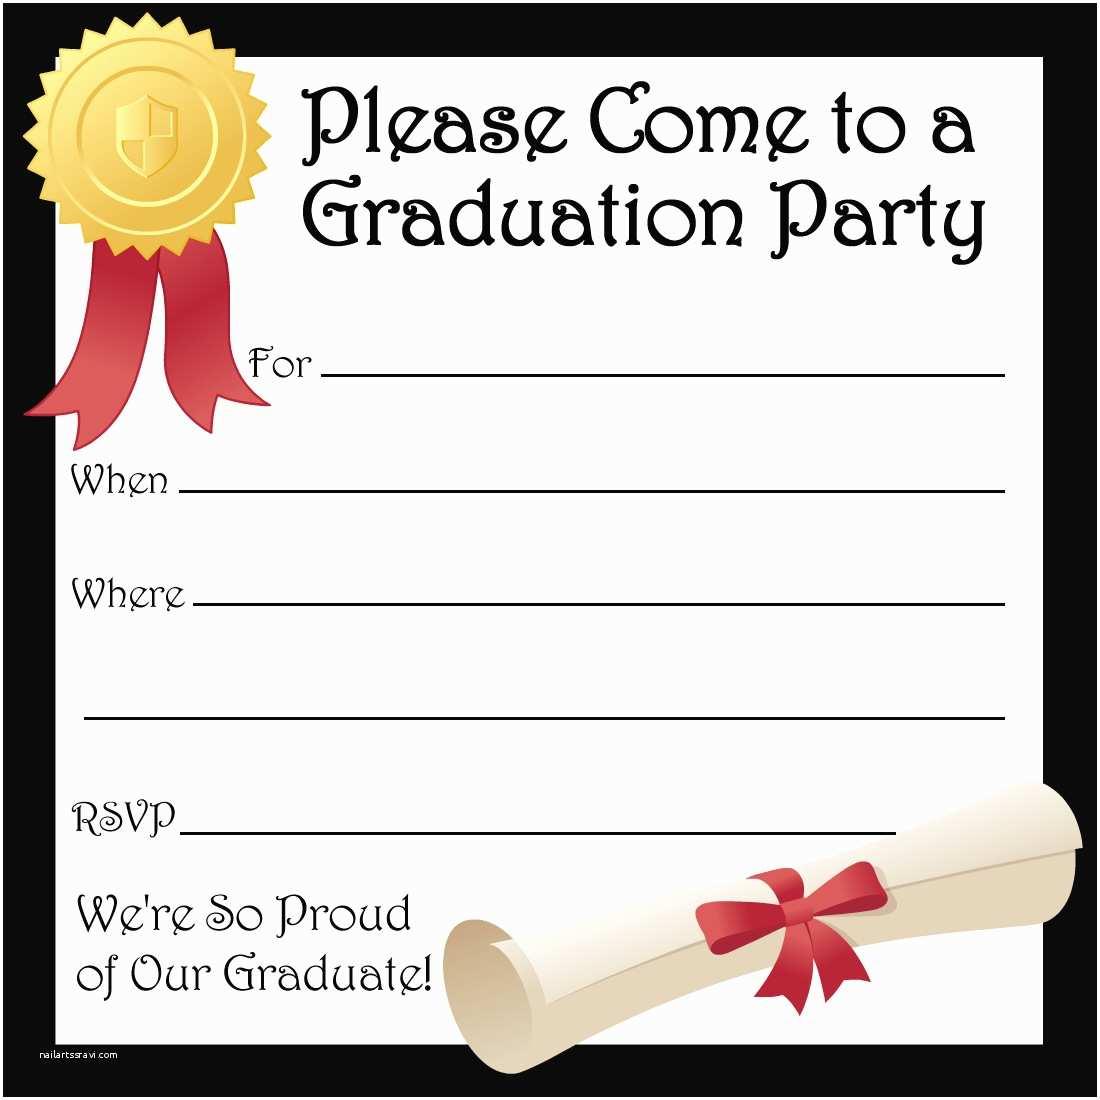 Graduation Open House Invitations Graduation Open House Invitation Template Various